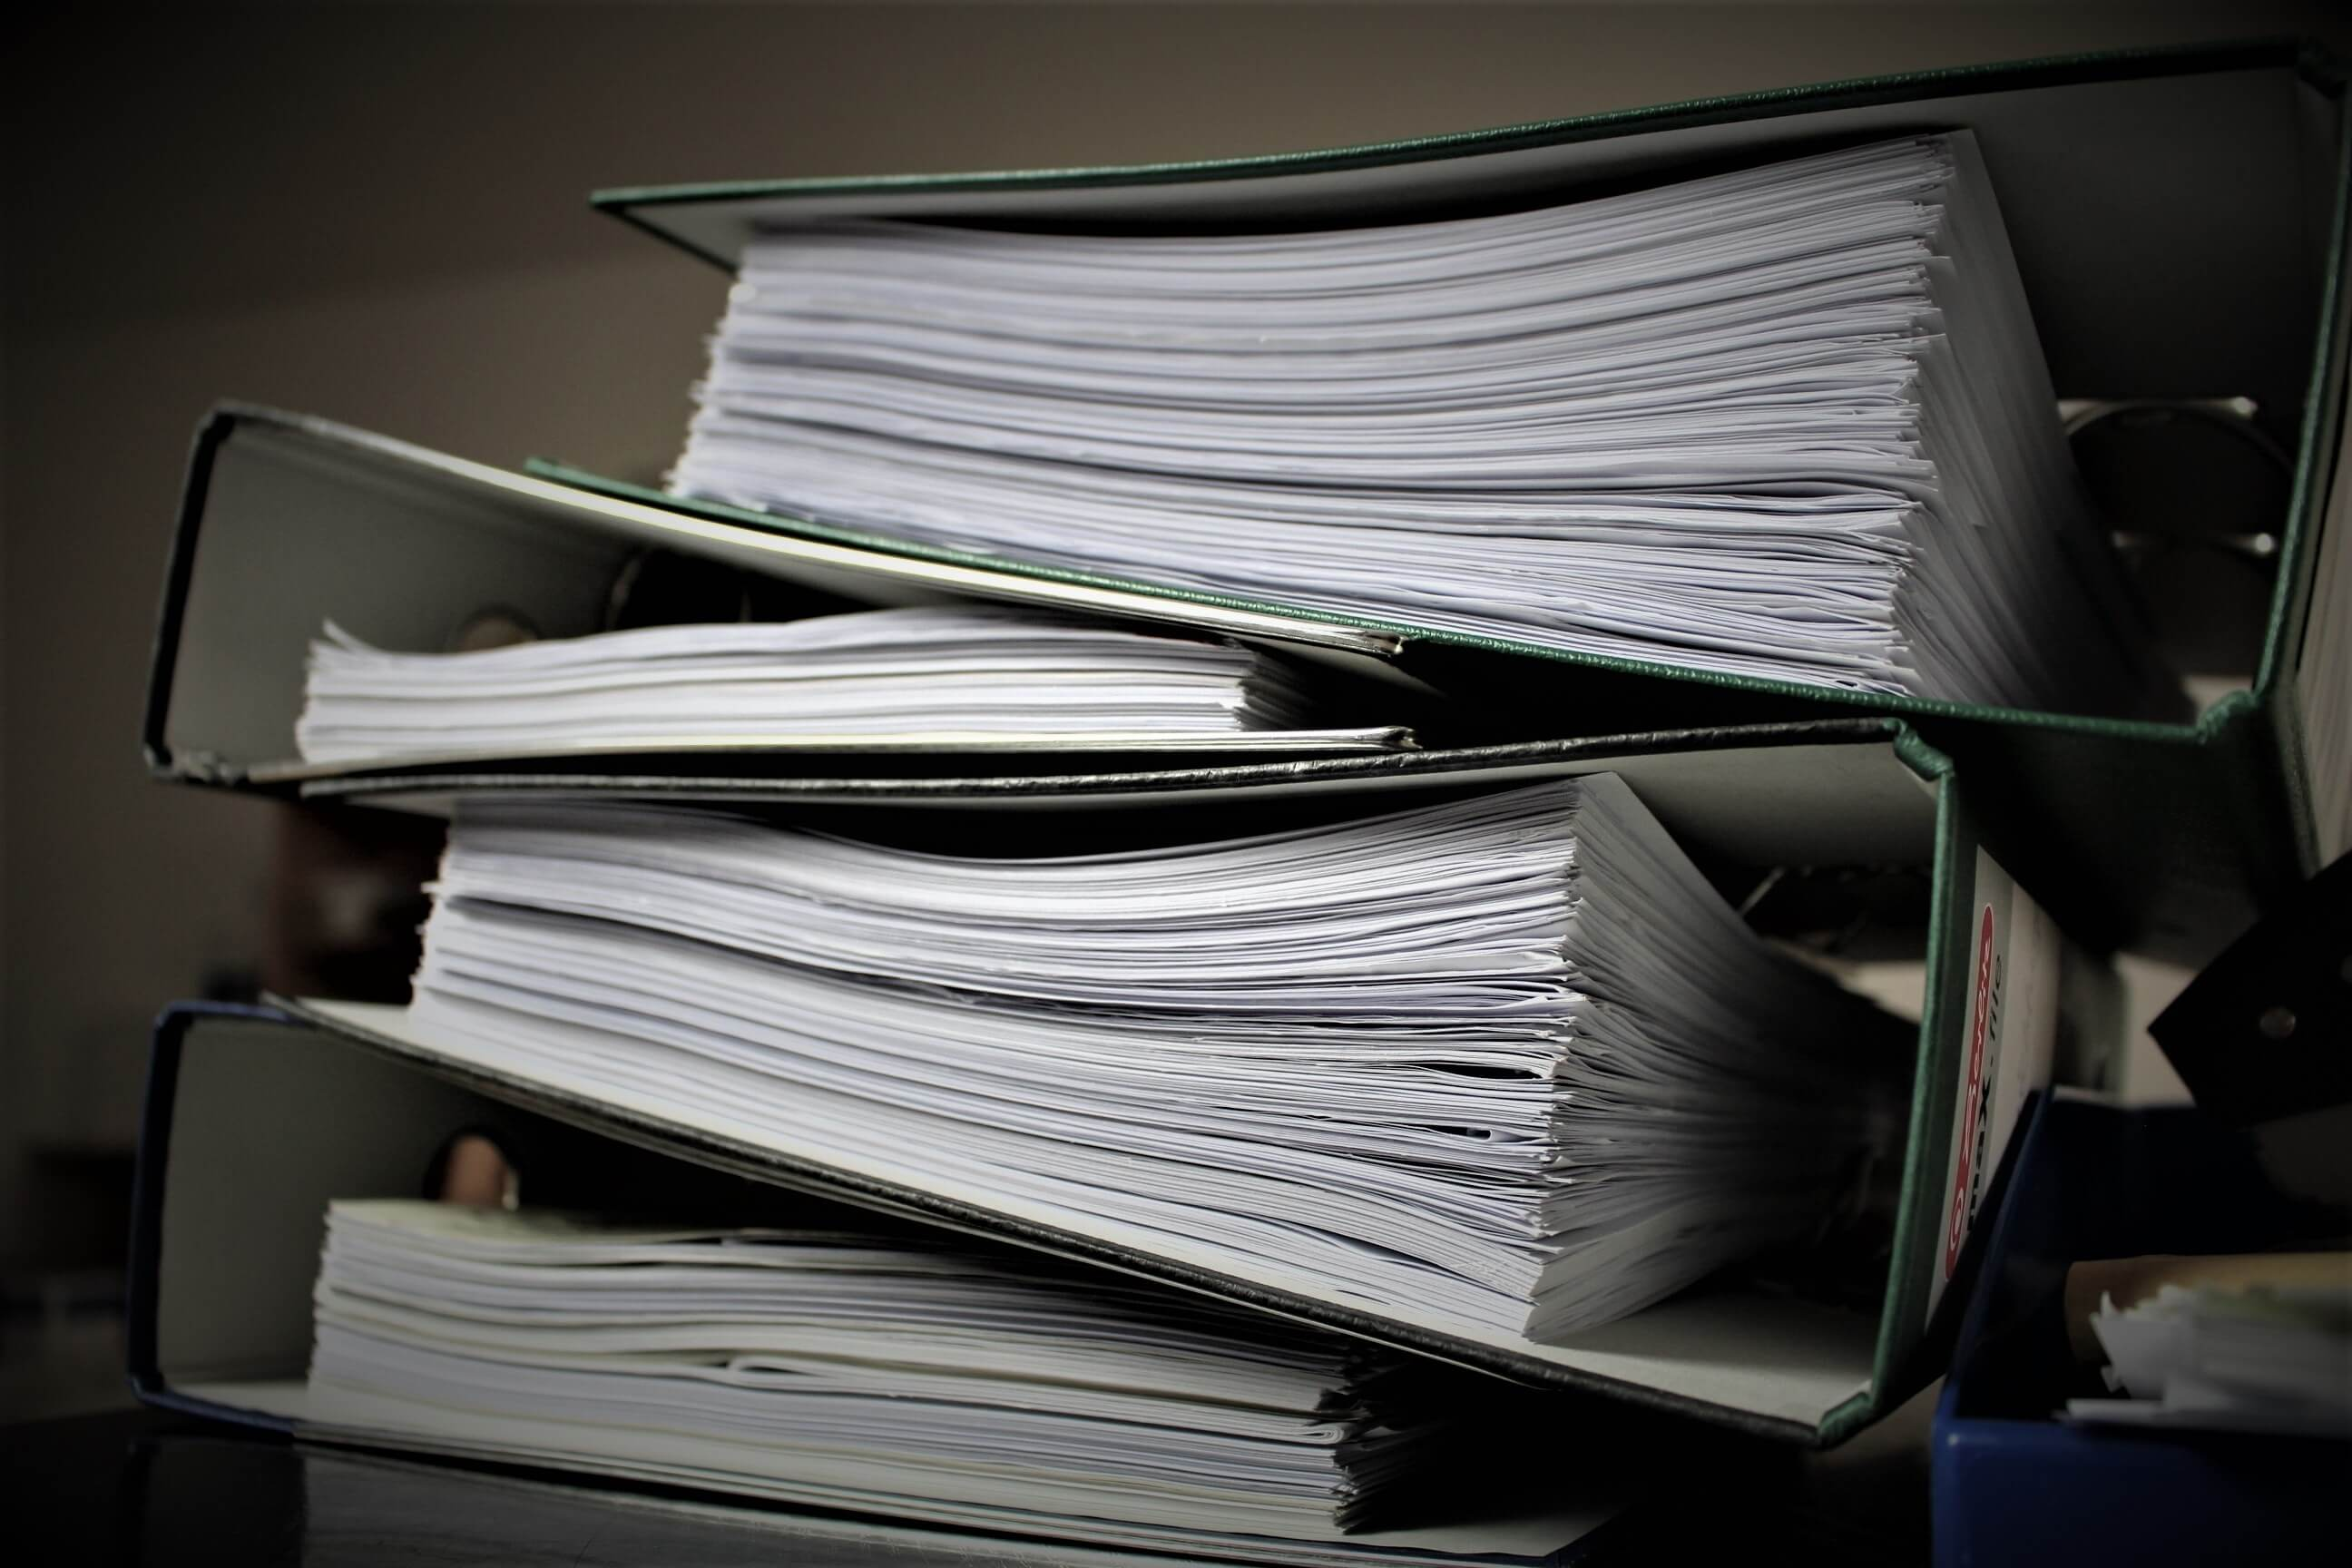 baudziamoji-byla-dokumentai-segtuvai.jpeg